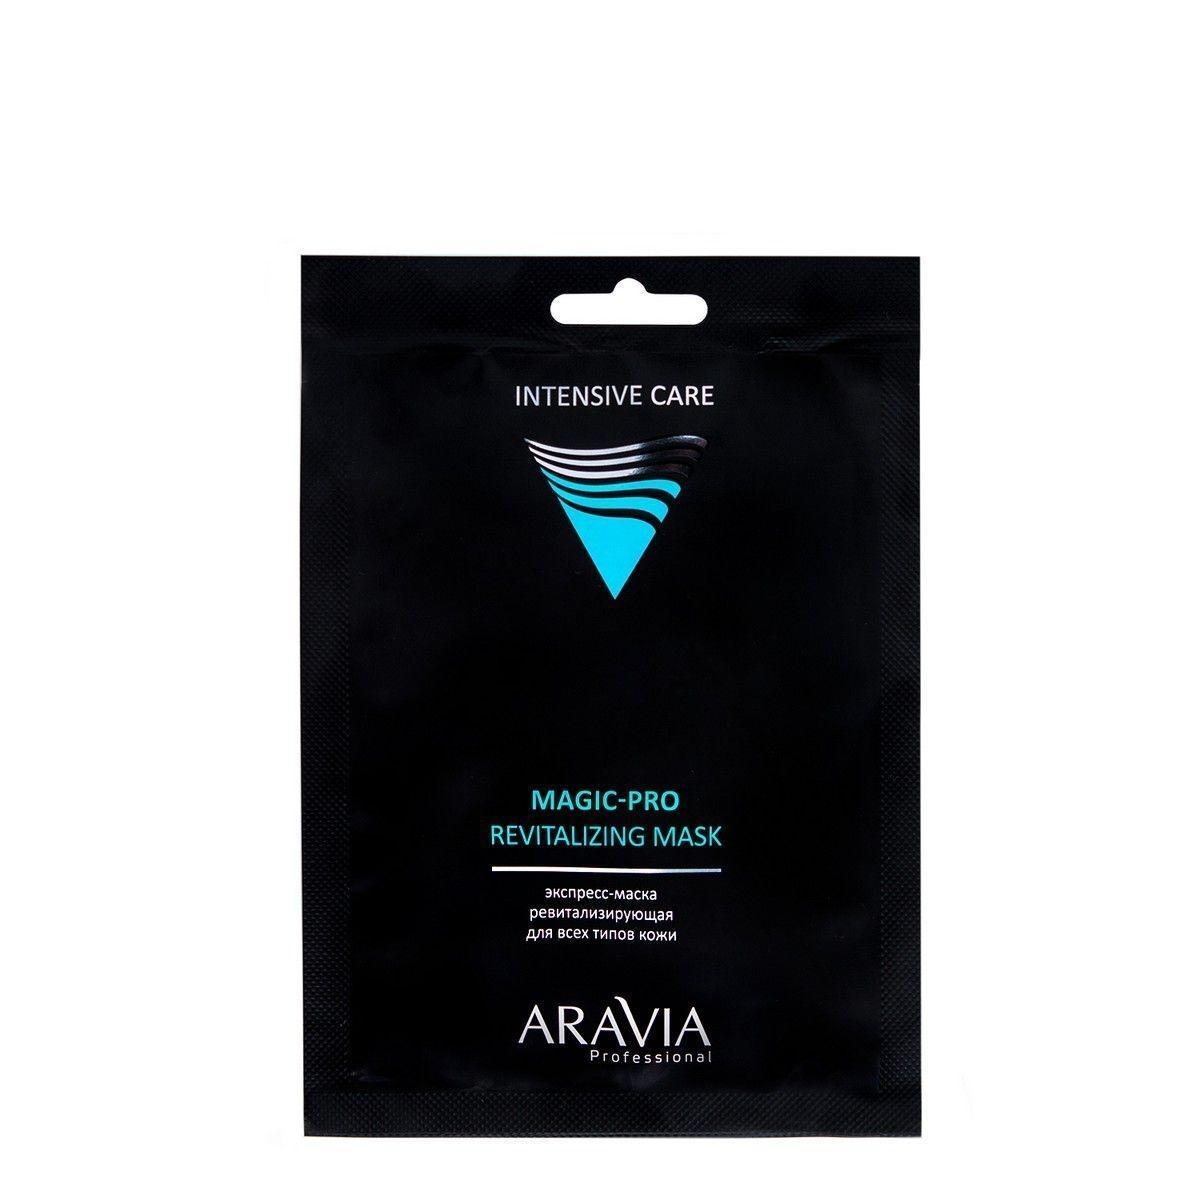 ARAVIA Экспресс-Маска Magic Pro Revitalizing Mask Ревитализирующая для всех Типов Кожи, 1 шт